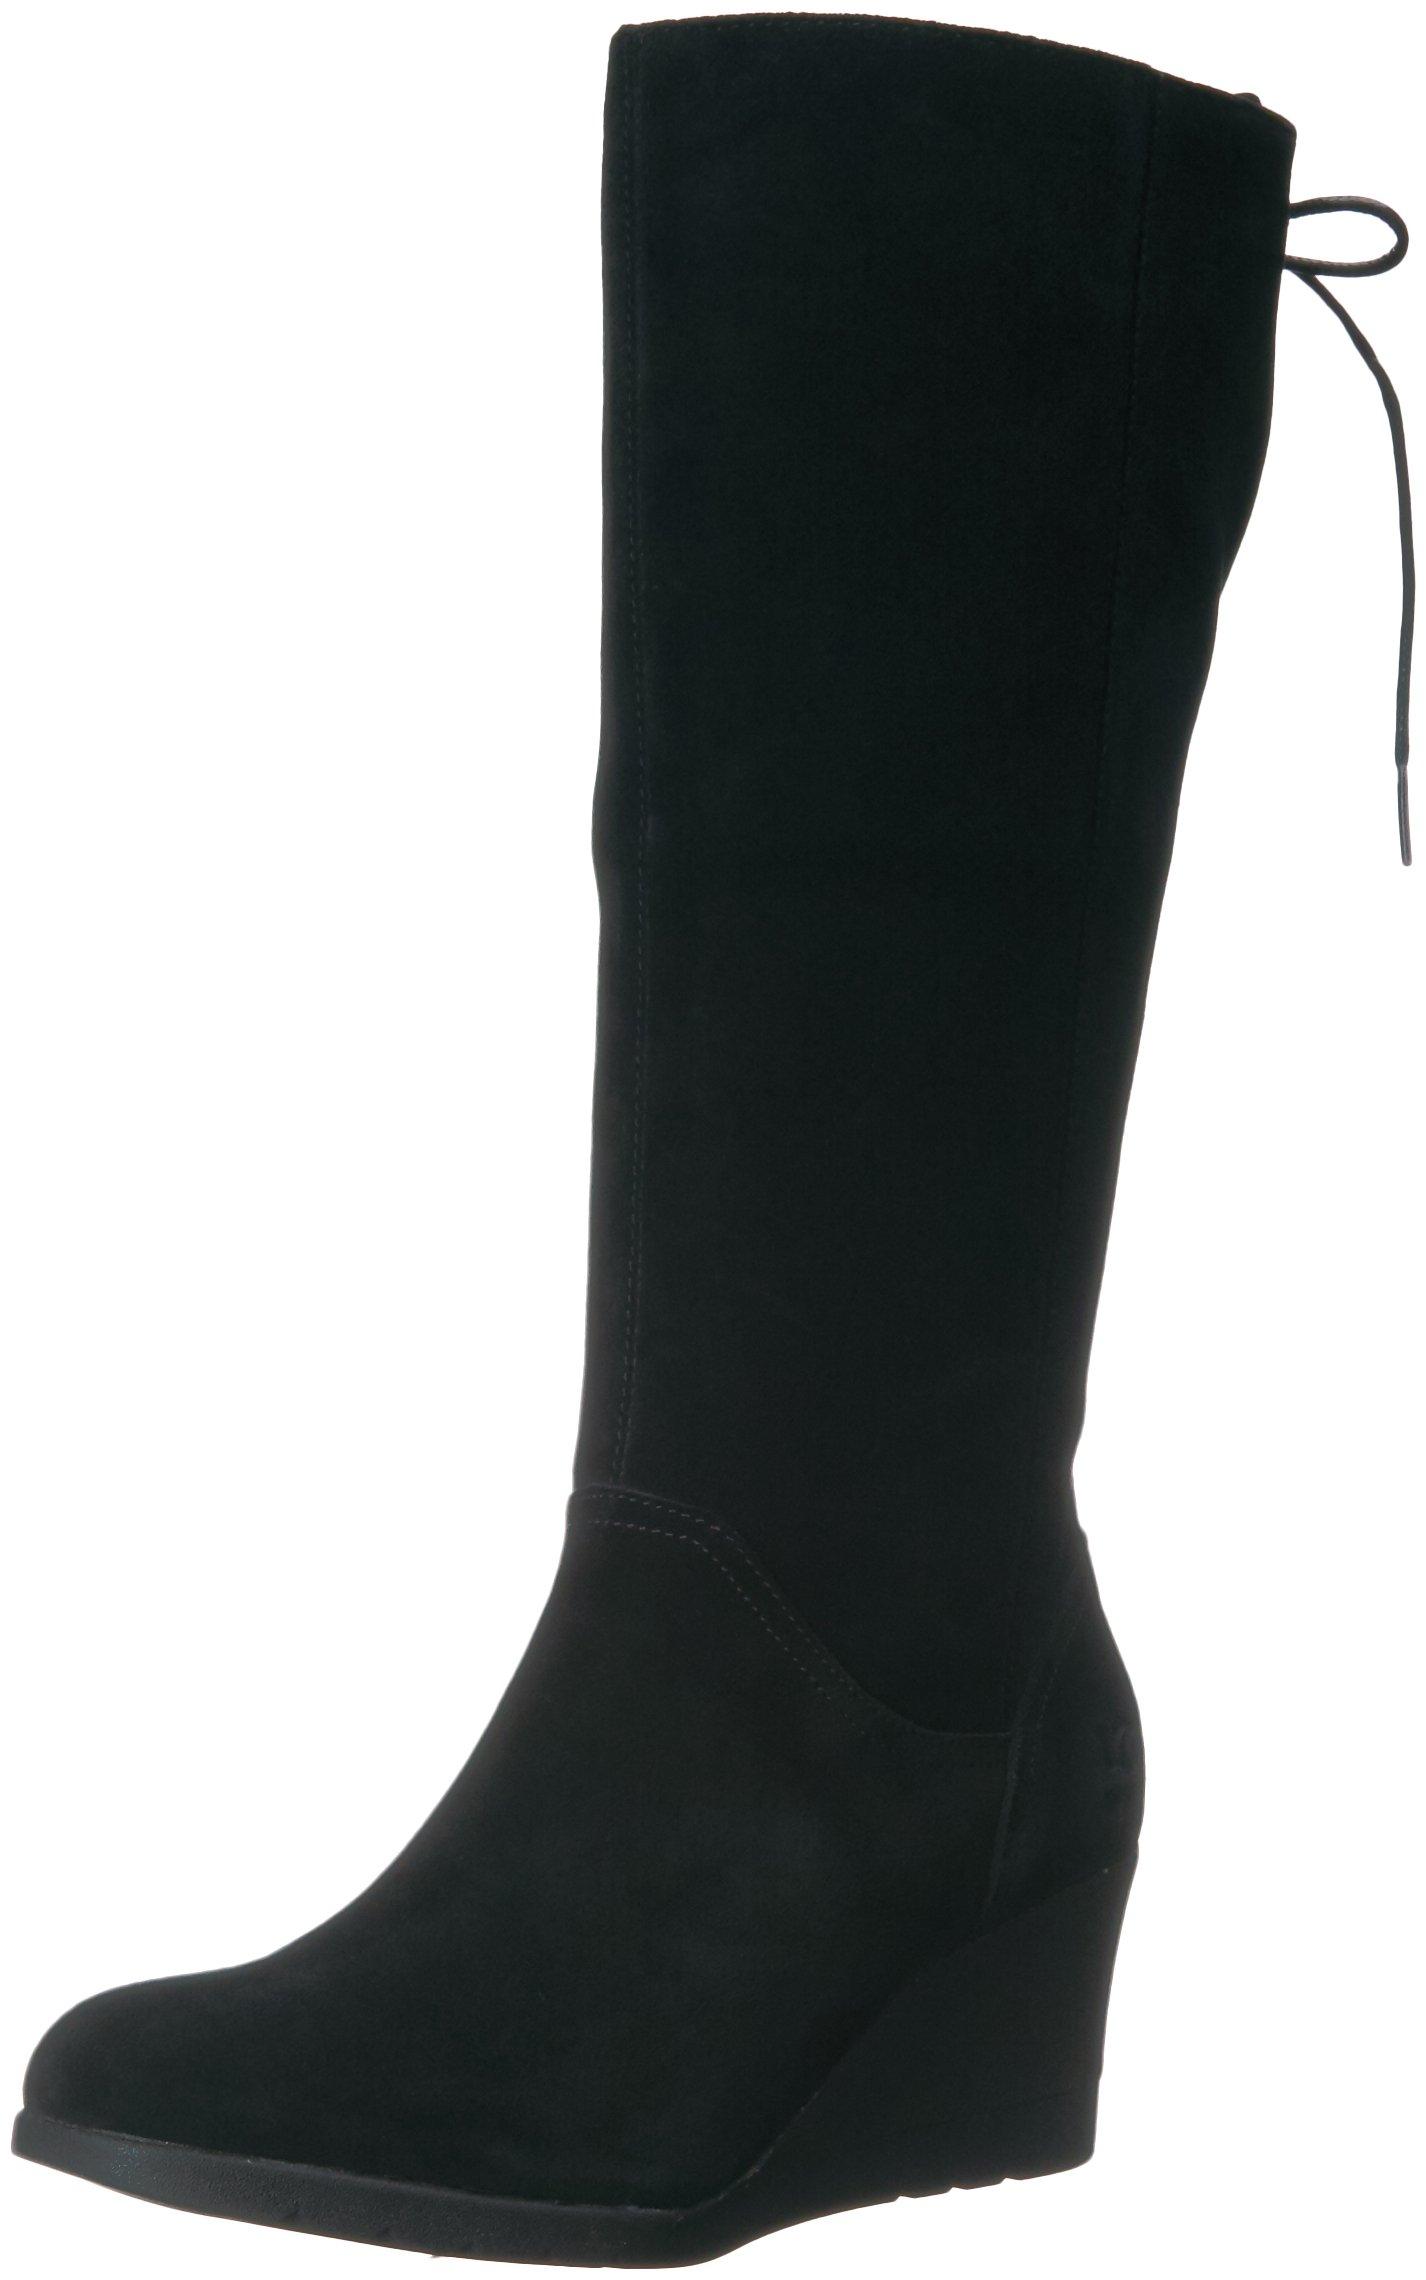 UGG Women's Dawna Winter Boot, Black, 9.5 M US